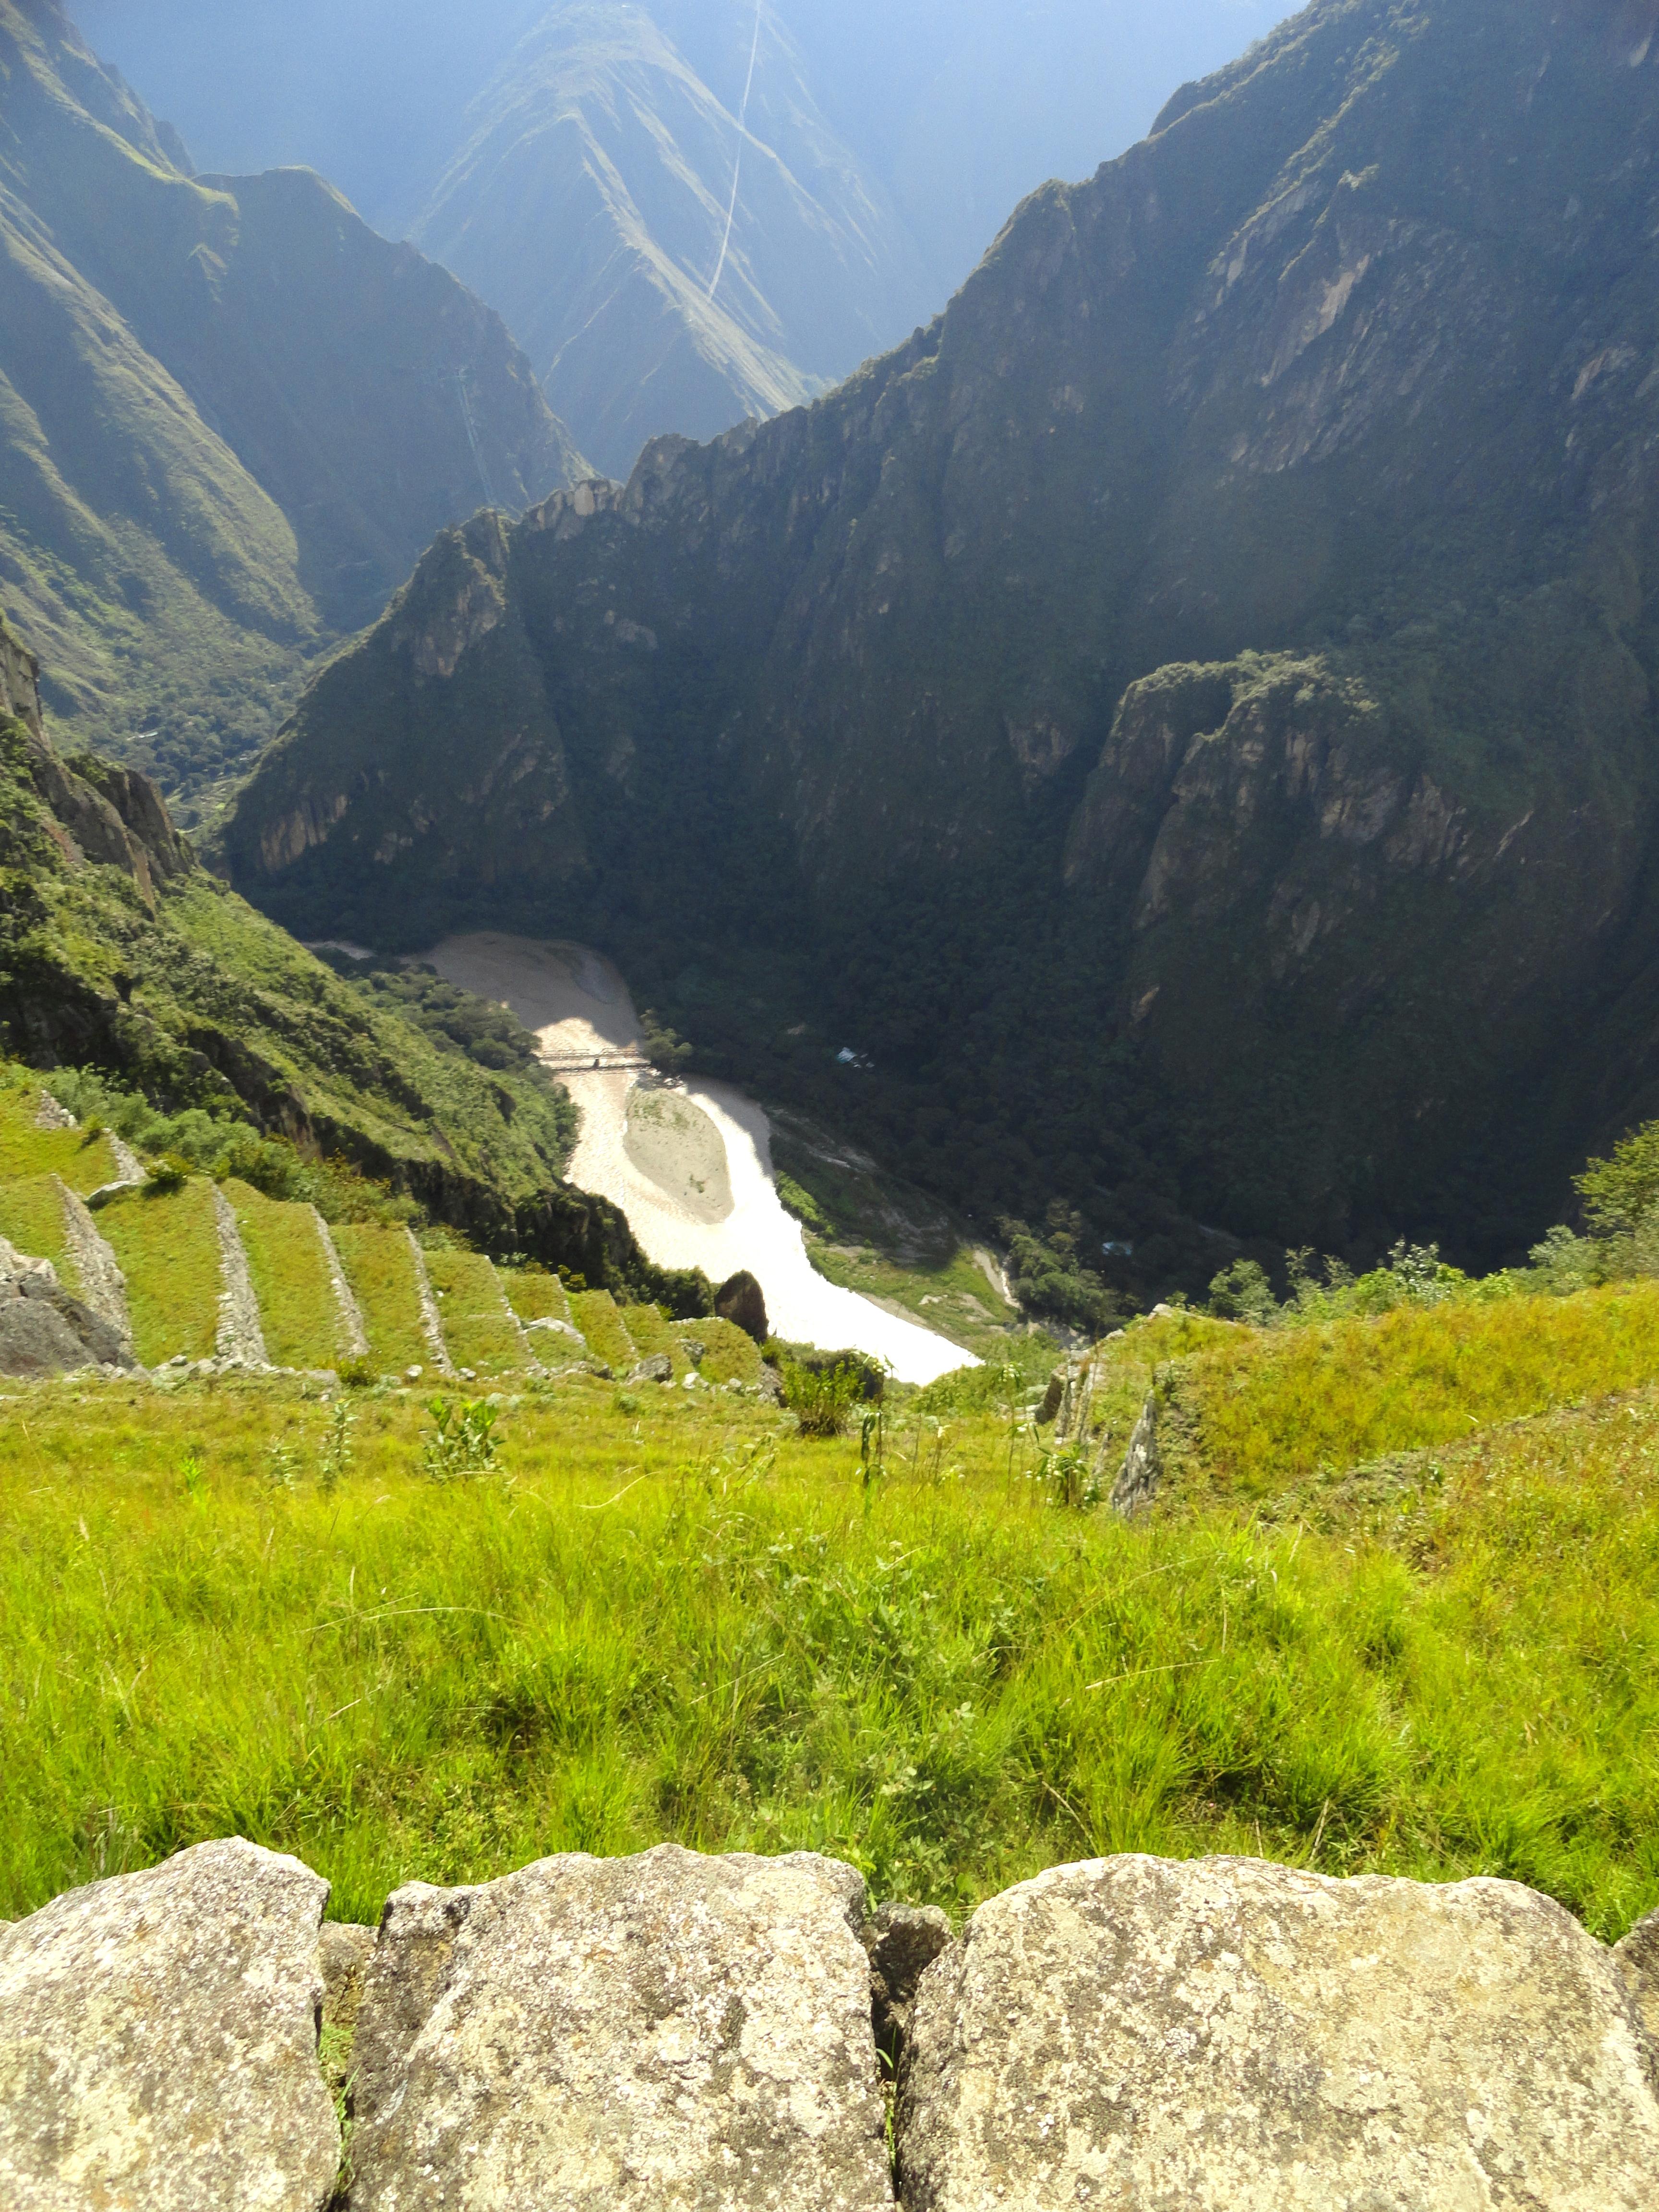 Getting To Machu Picchu